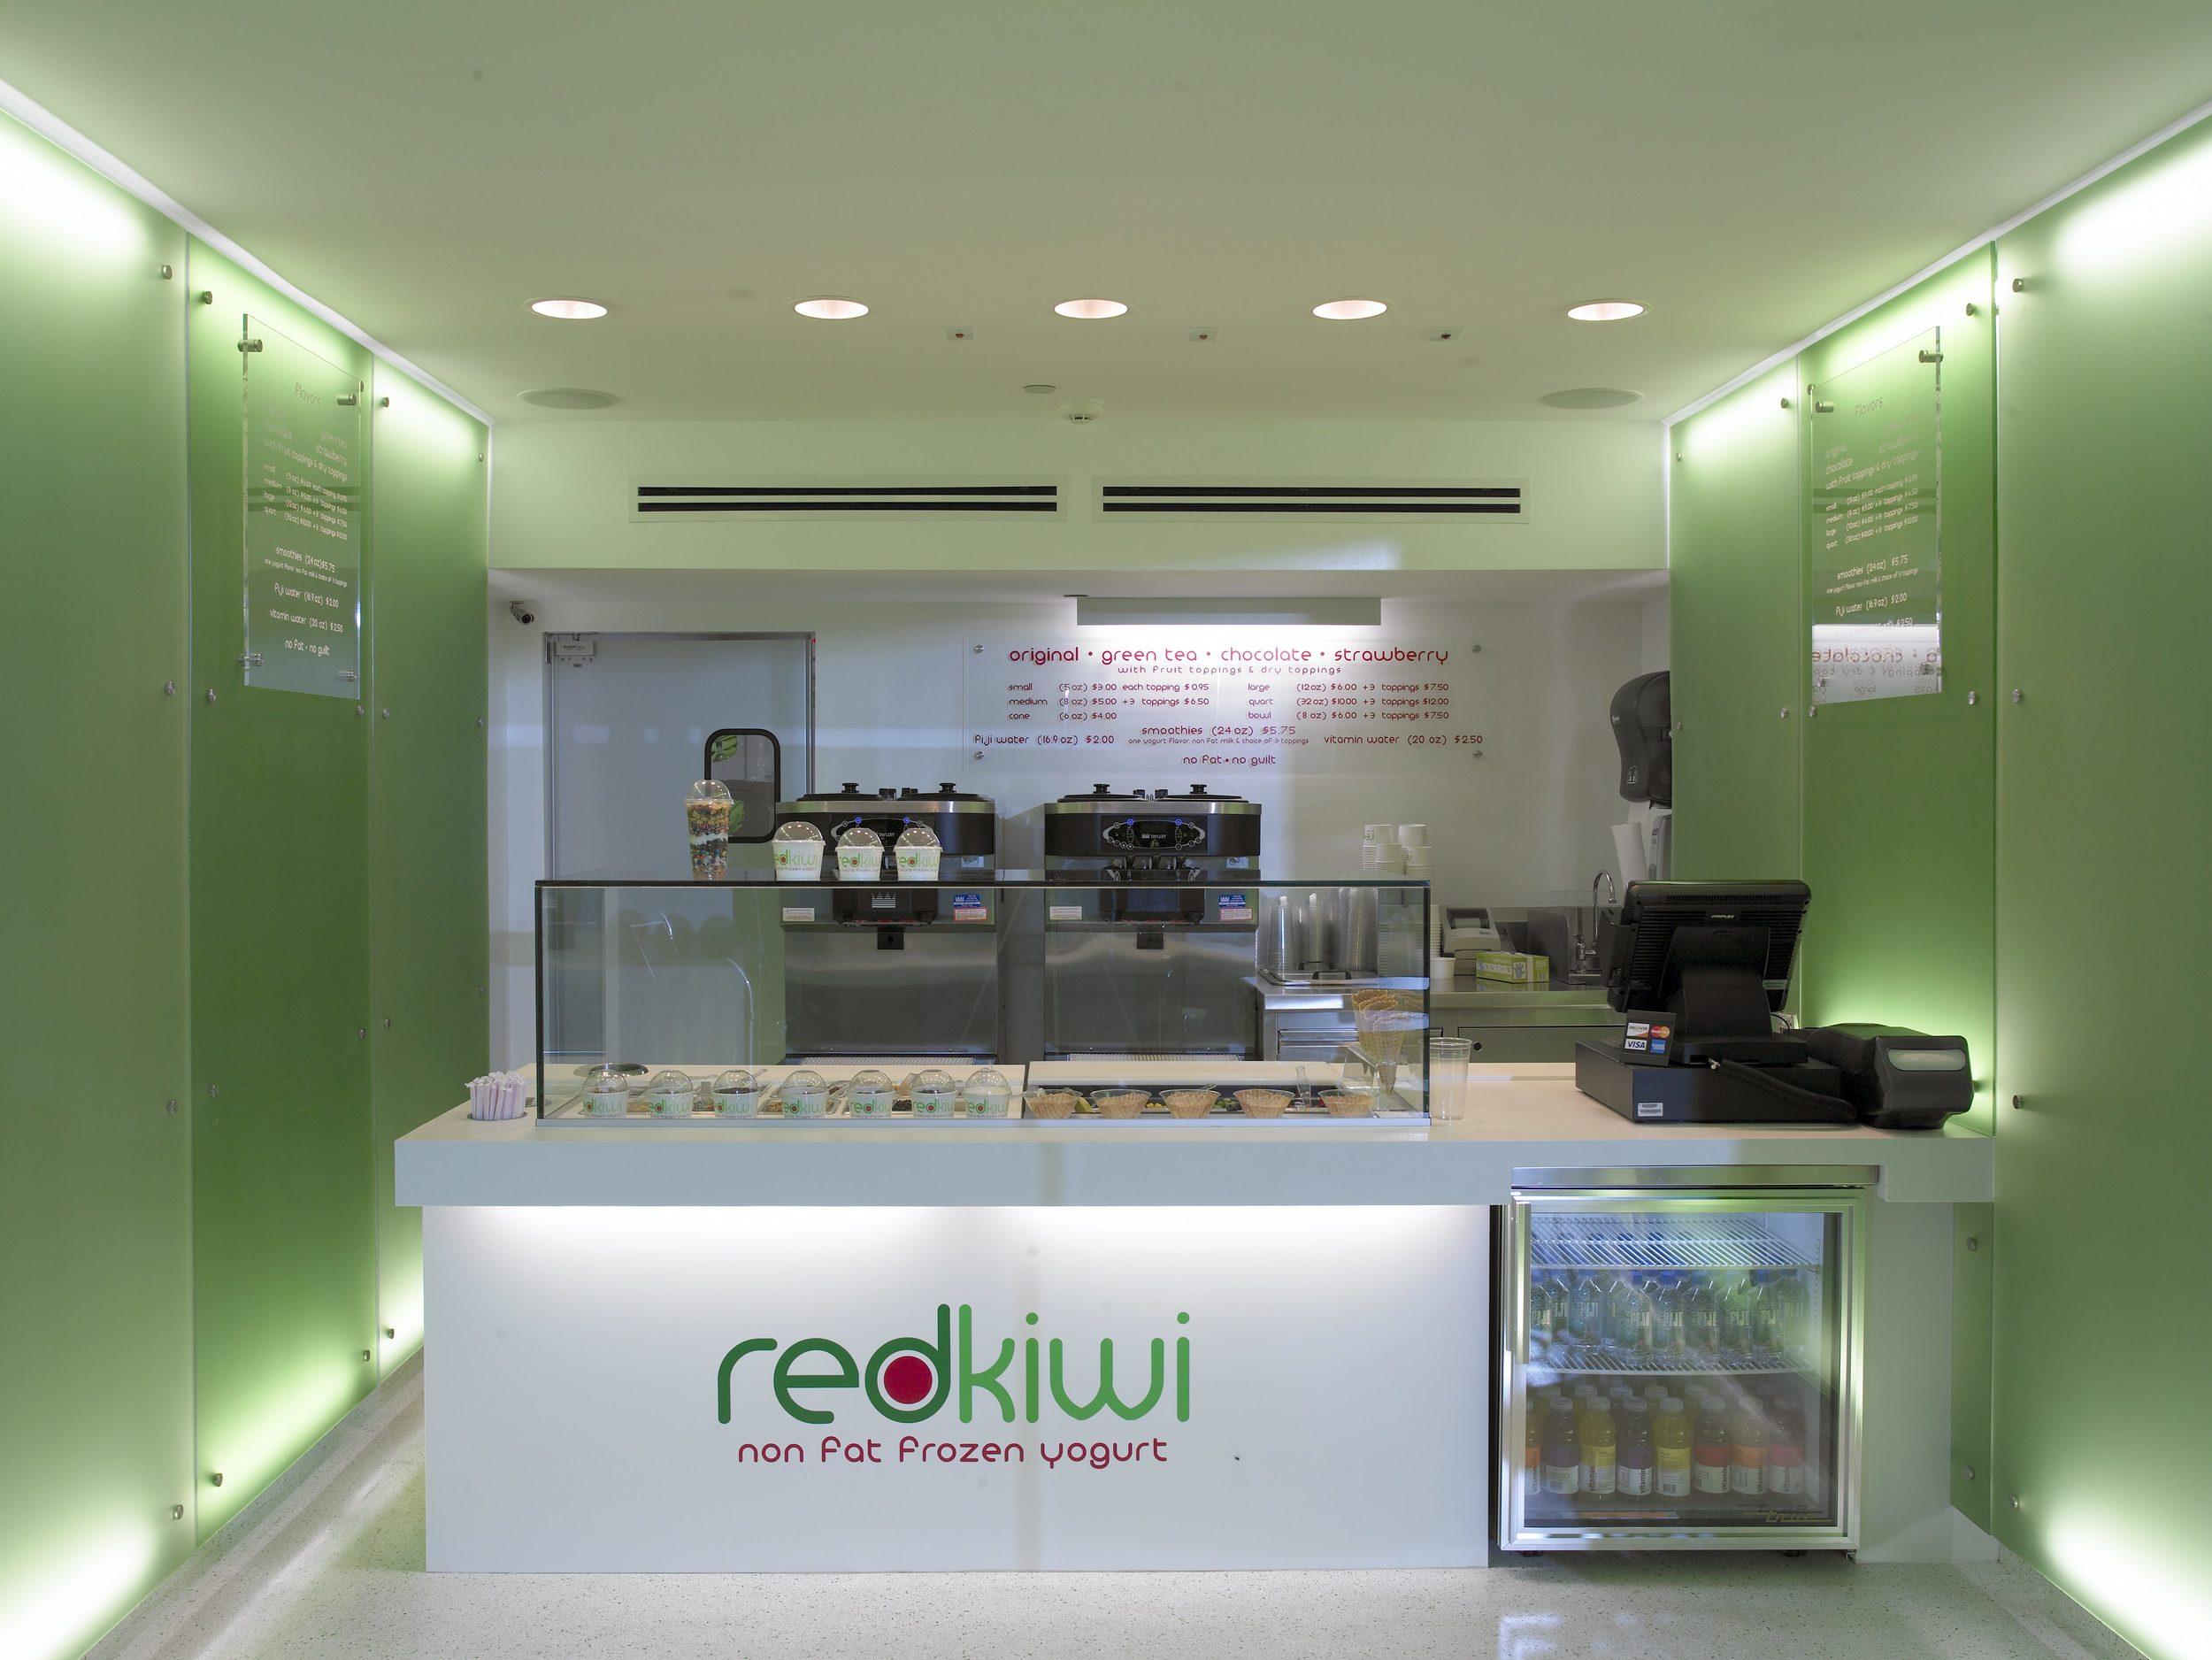 Red Kiwi Store 2-058825.jpg